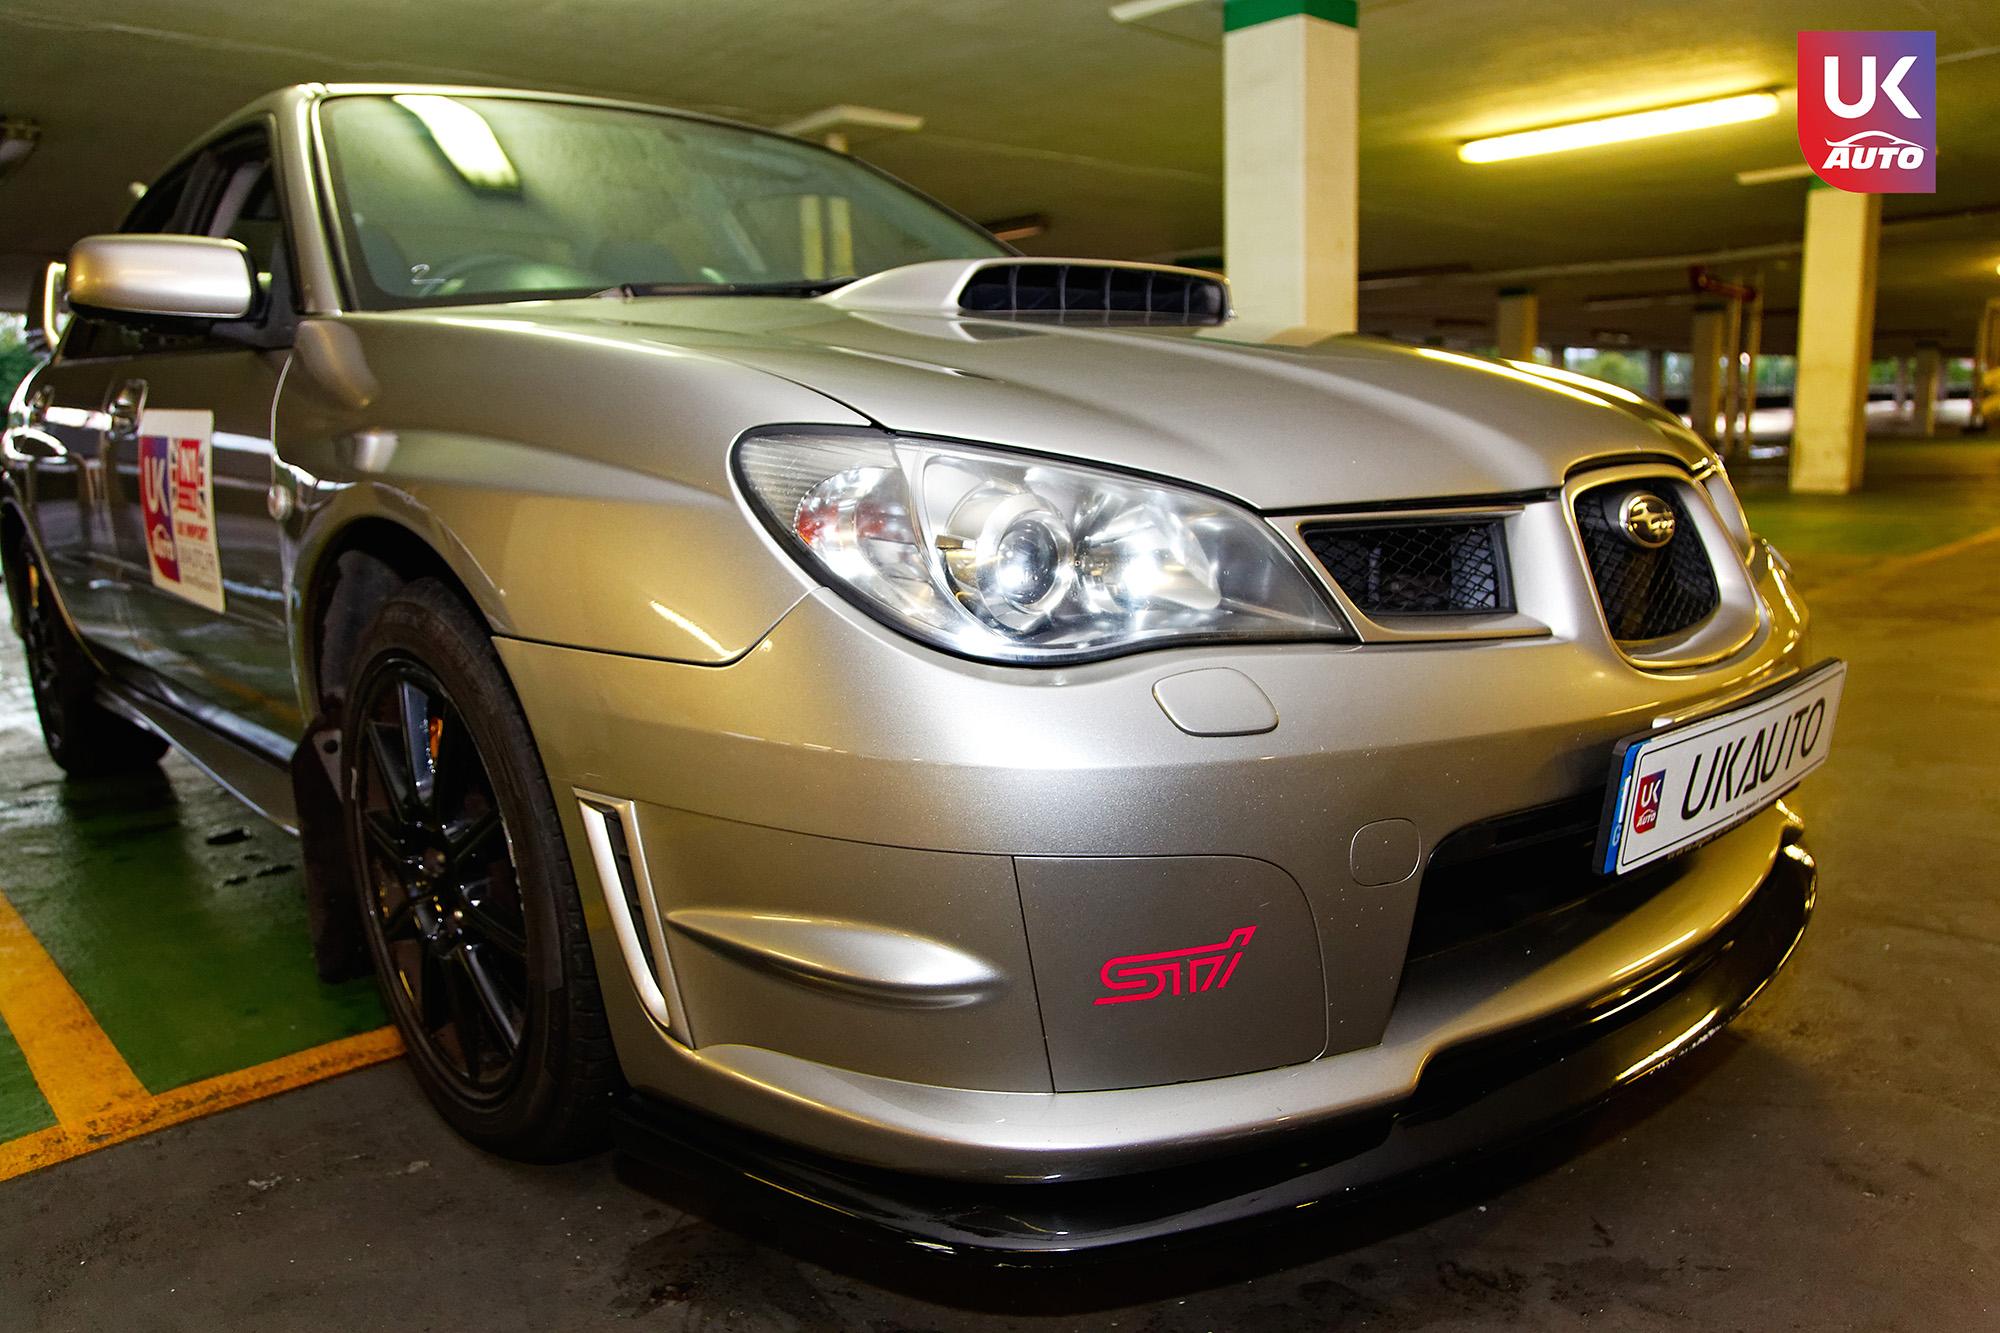 import subaru impreza wrx sti rhd import voiture angleterre auto import3 - Felecitation a Christophe pour cette Subaru Impreza Wrx Sti RHD Supercharged Importation voiture angleterre